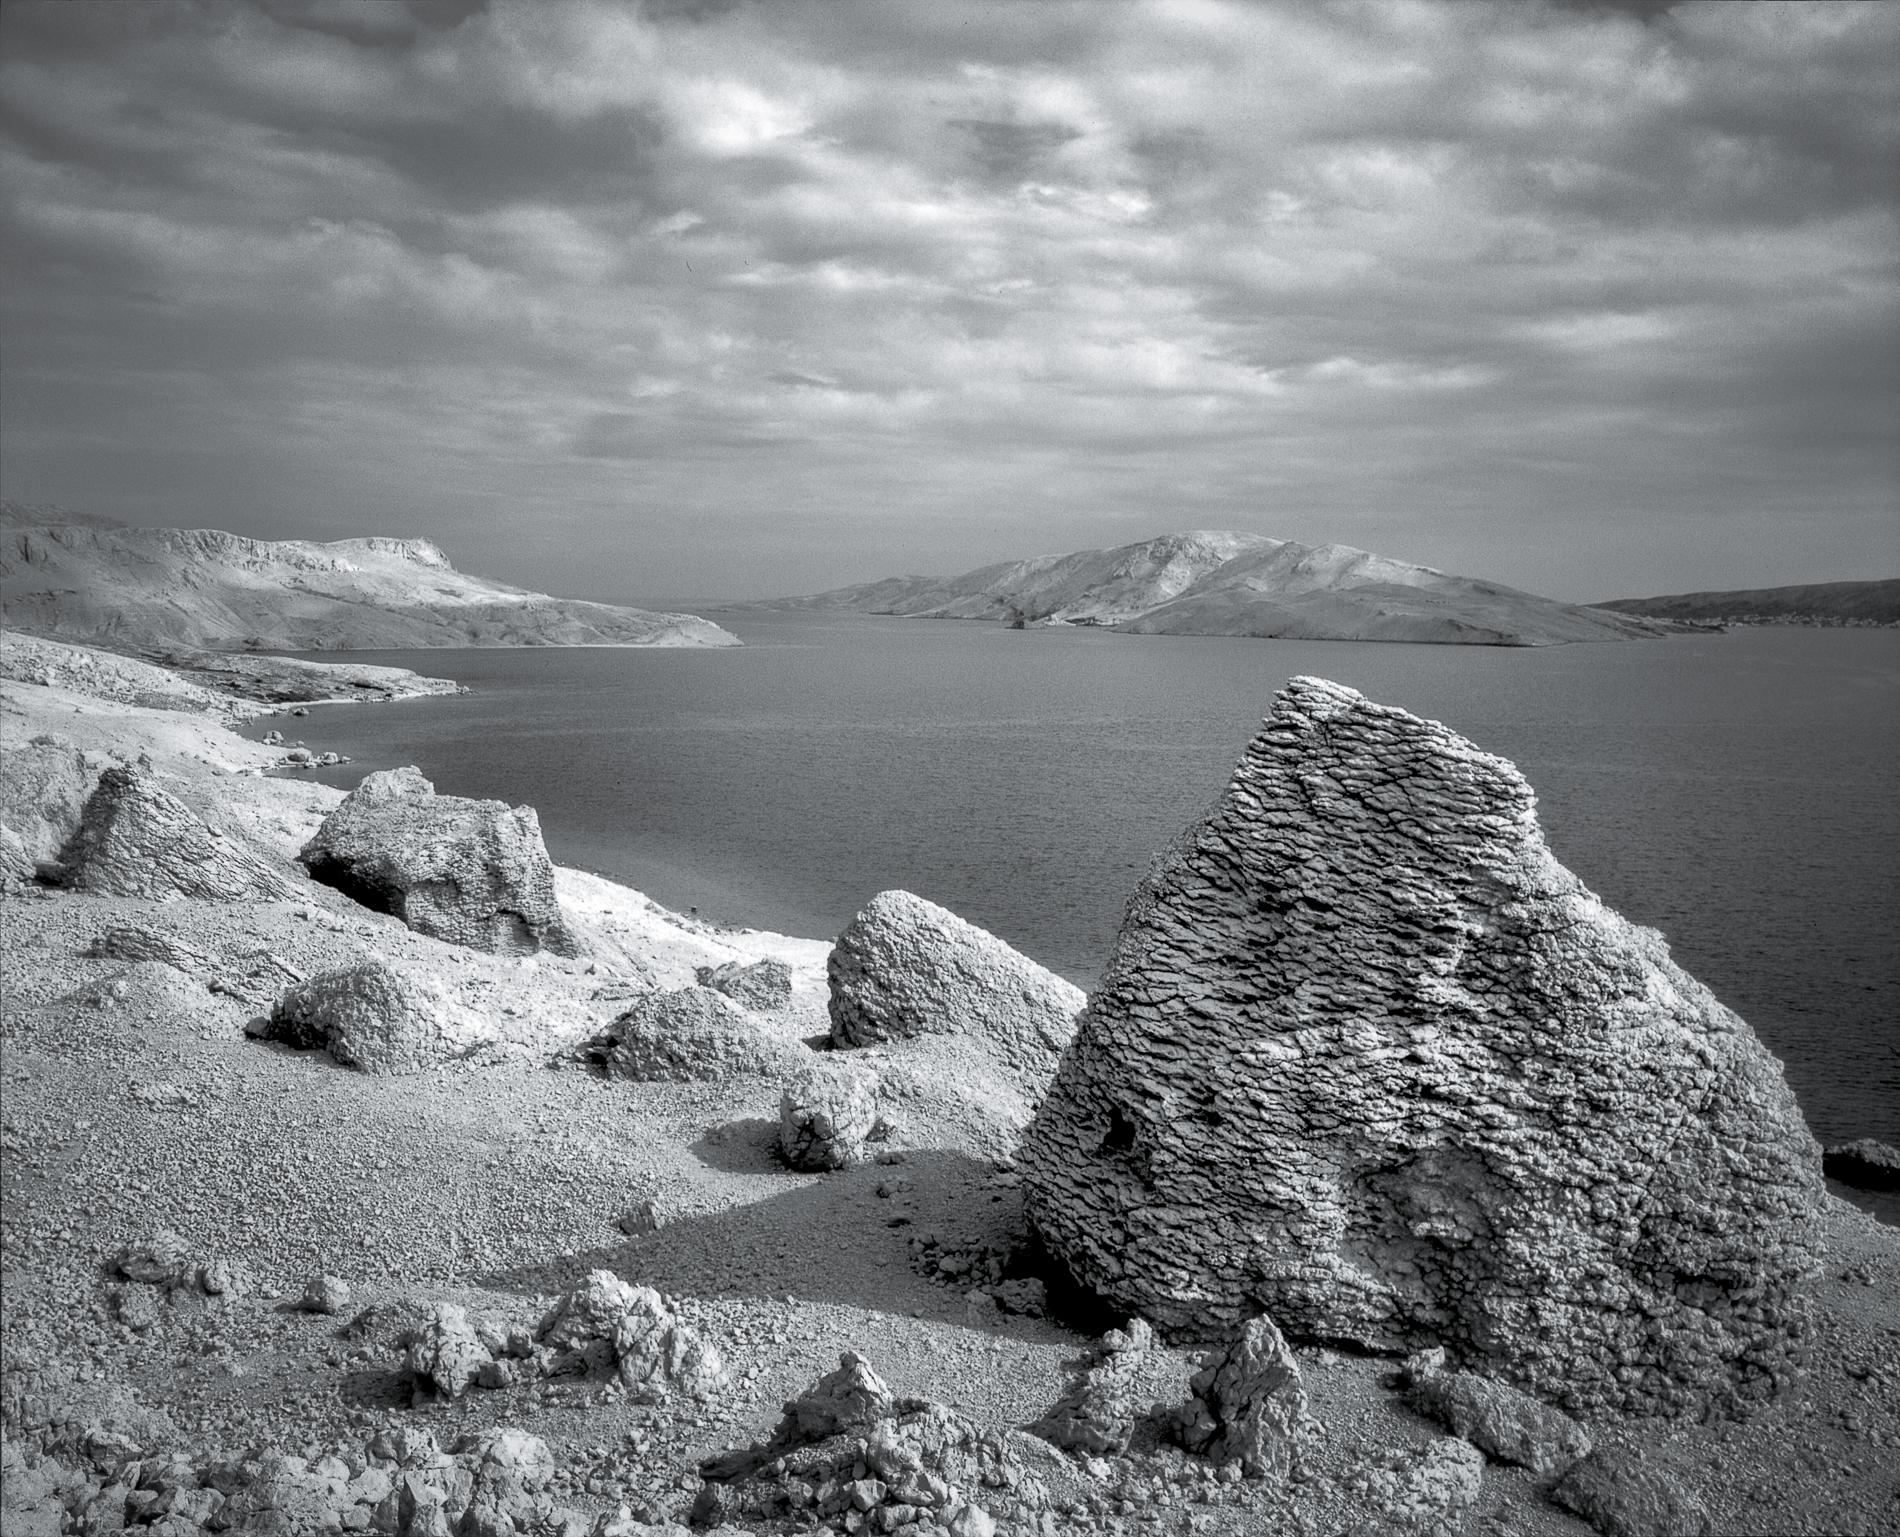 Aeon Garden of Stones | Mamiya RZ76 | Rollei RPX 100 | Kornelije Sajler